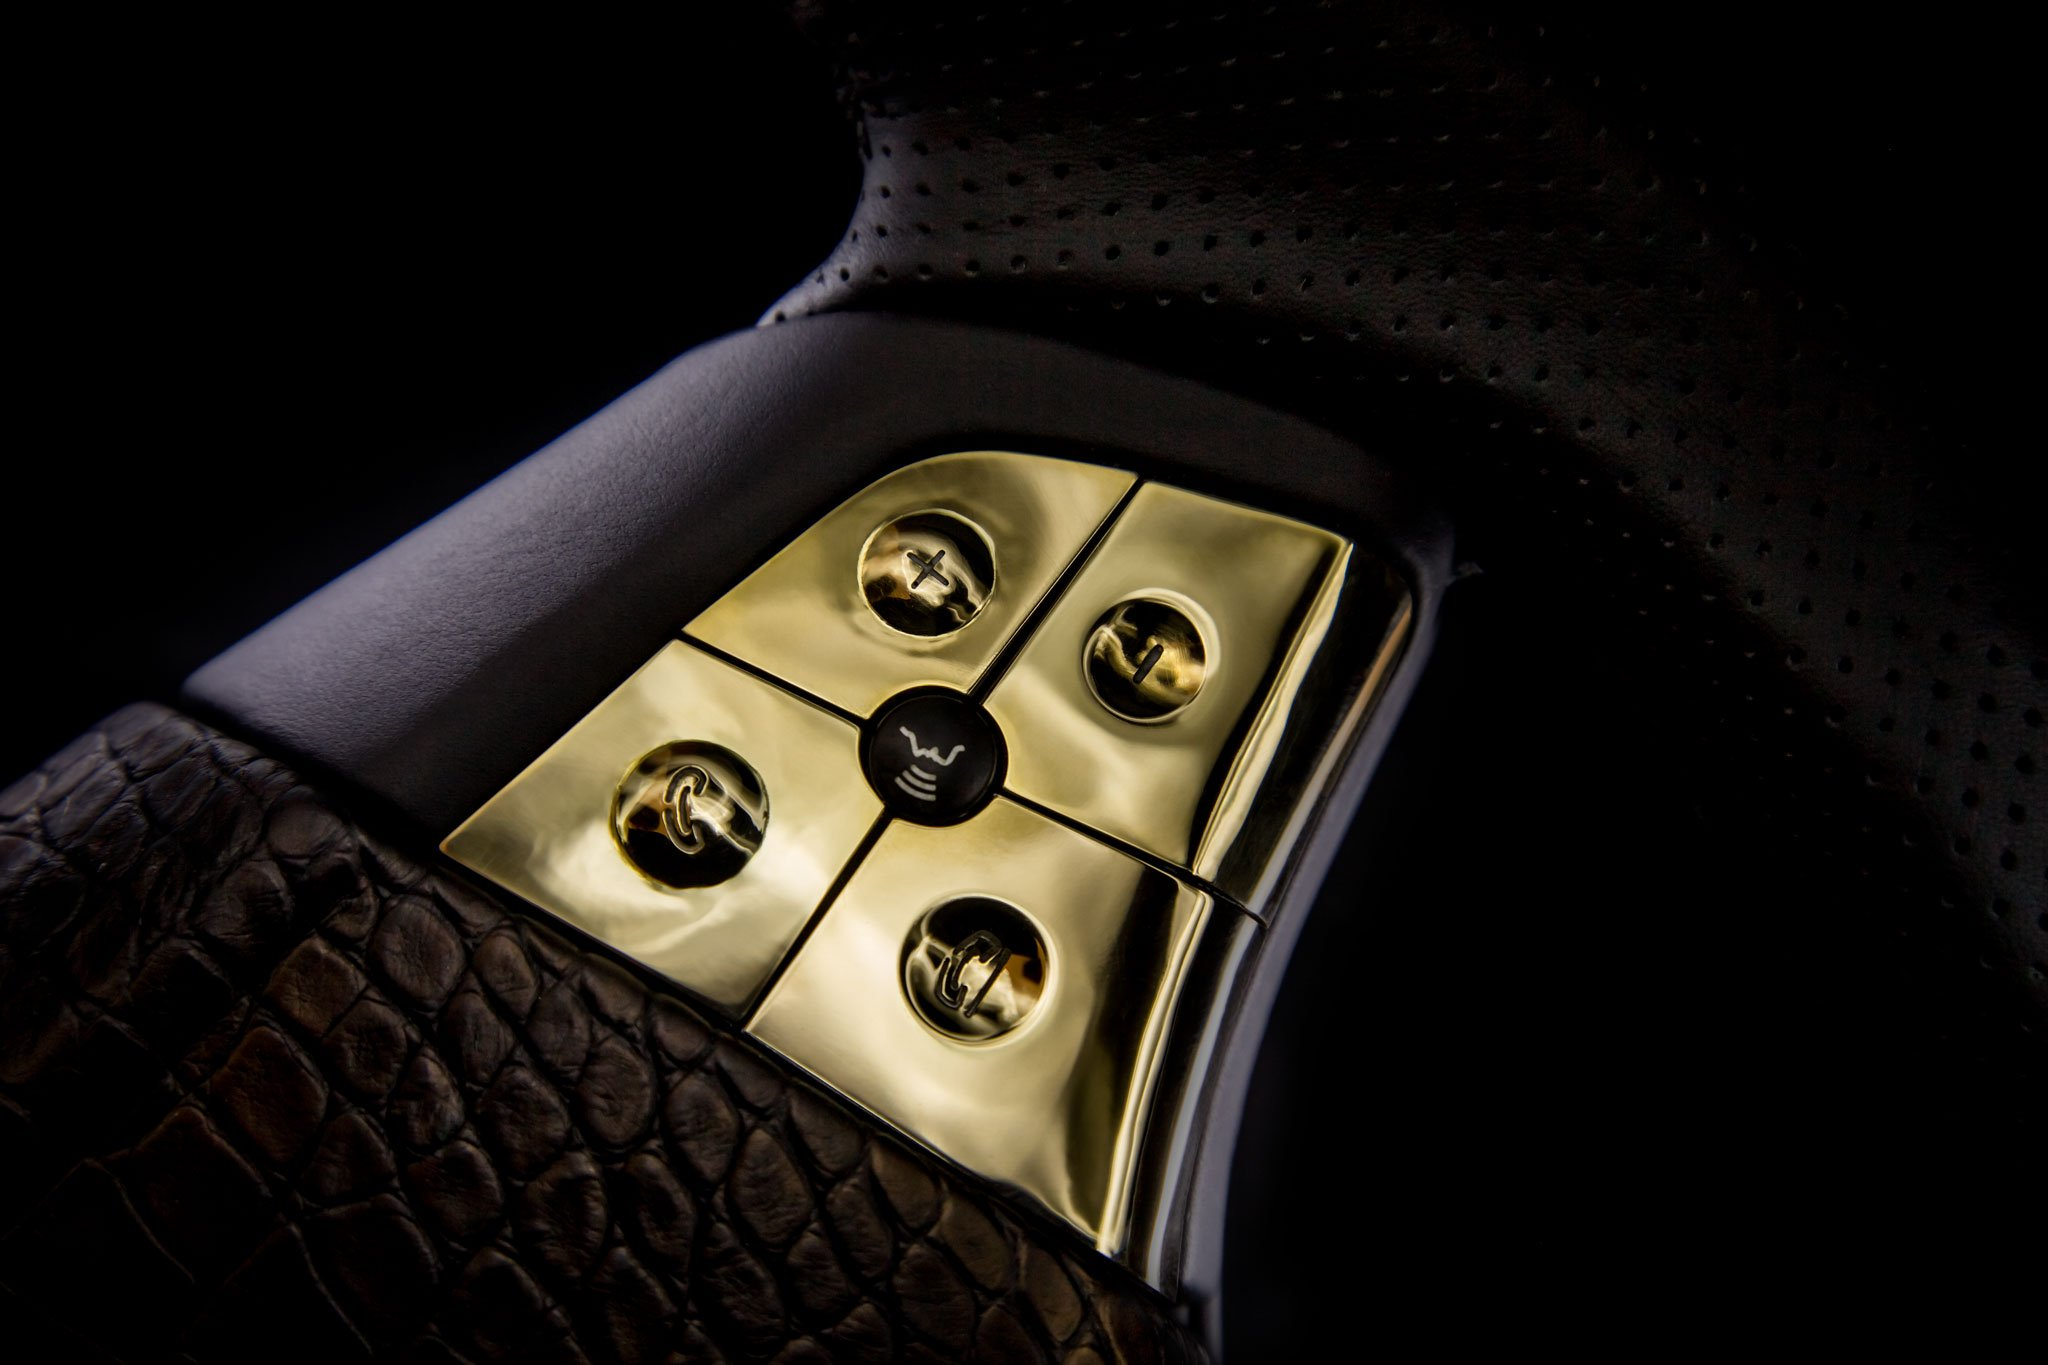 DARTZ_Prombron_Black_Alligatoir_Steering_wheel_buttons_14Kgold_2